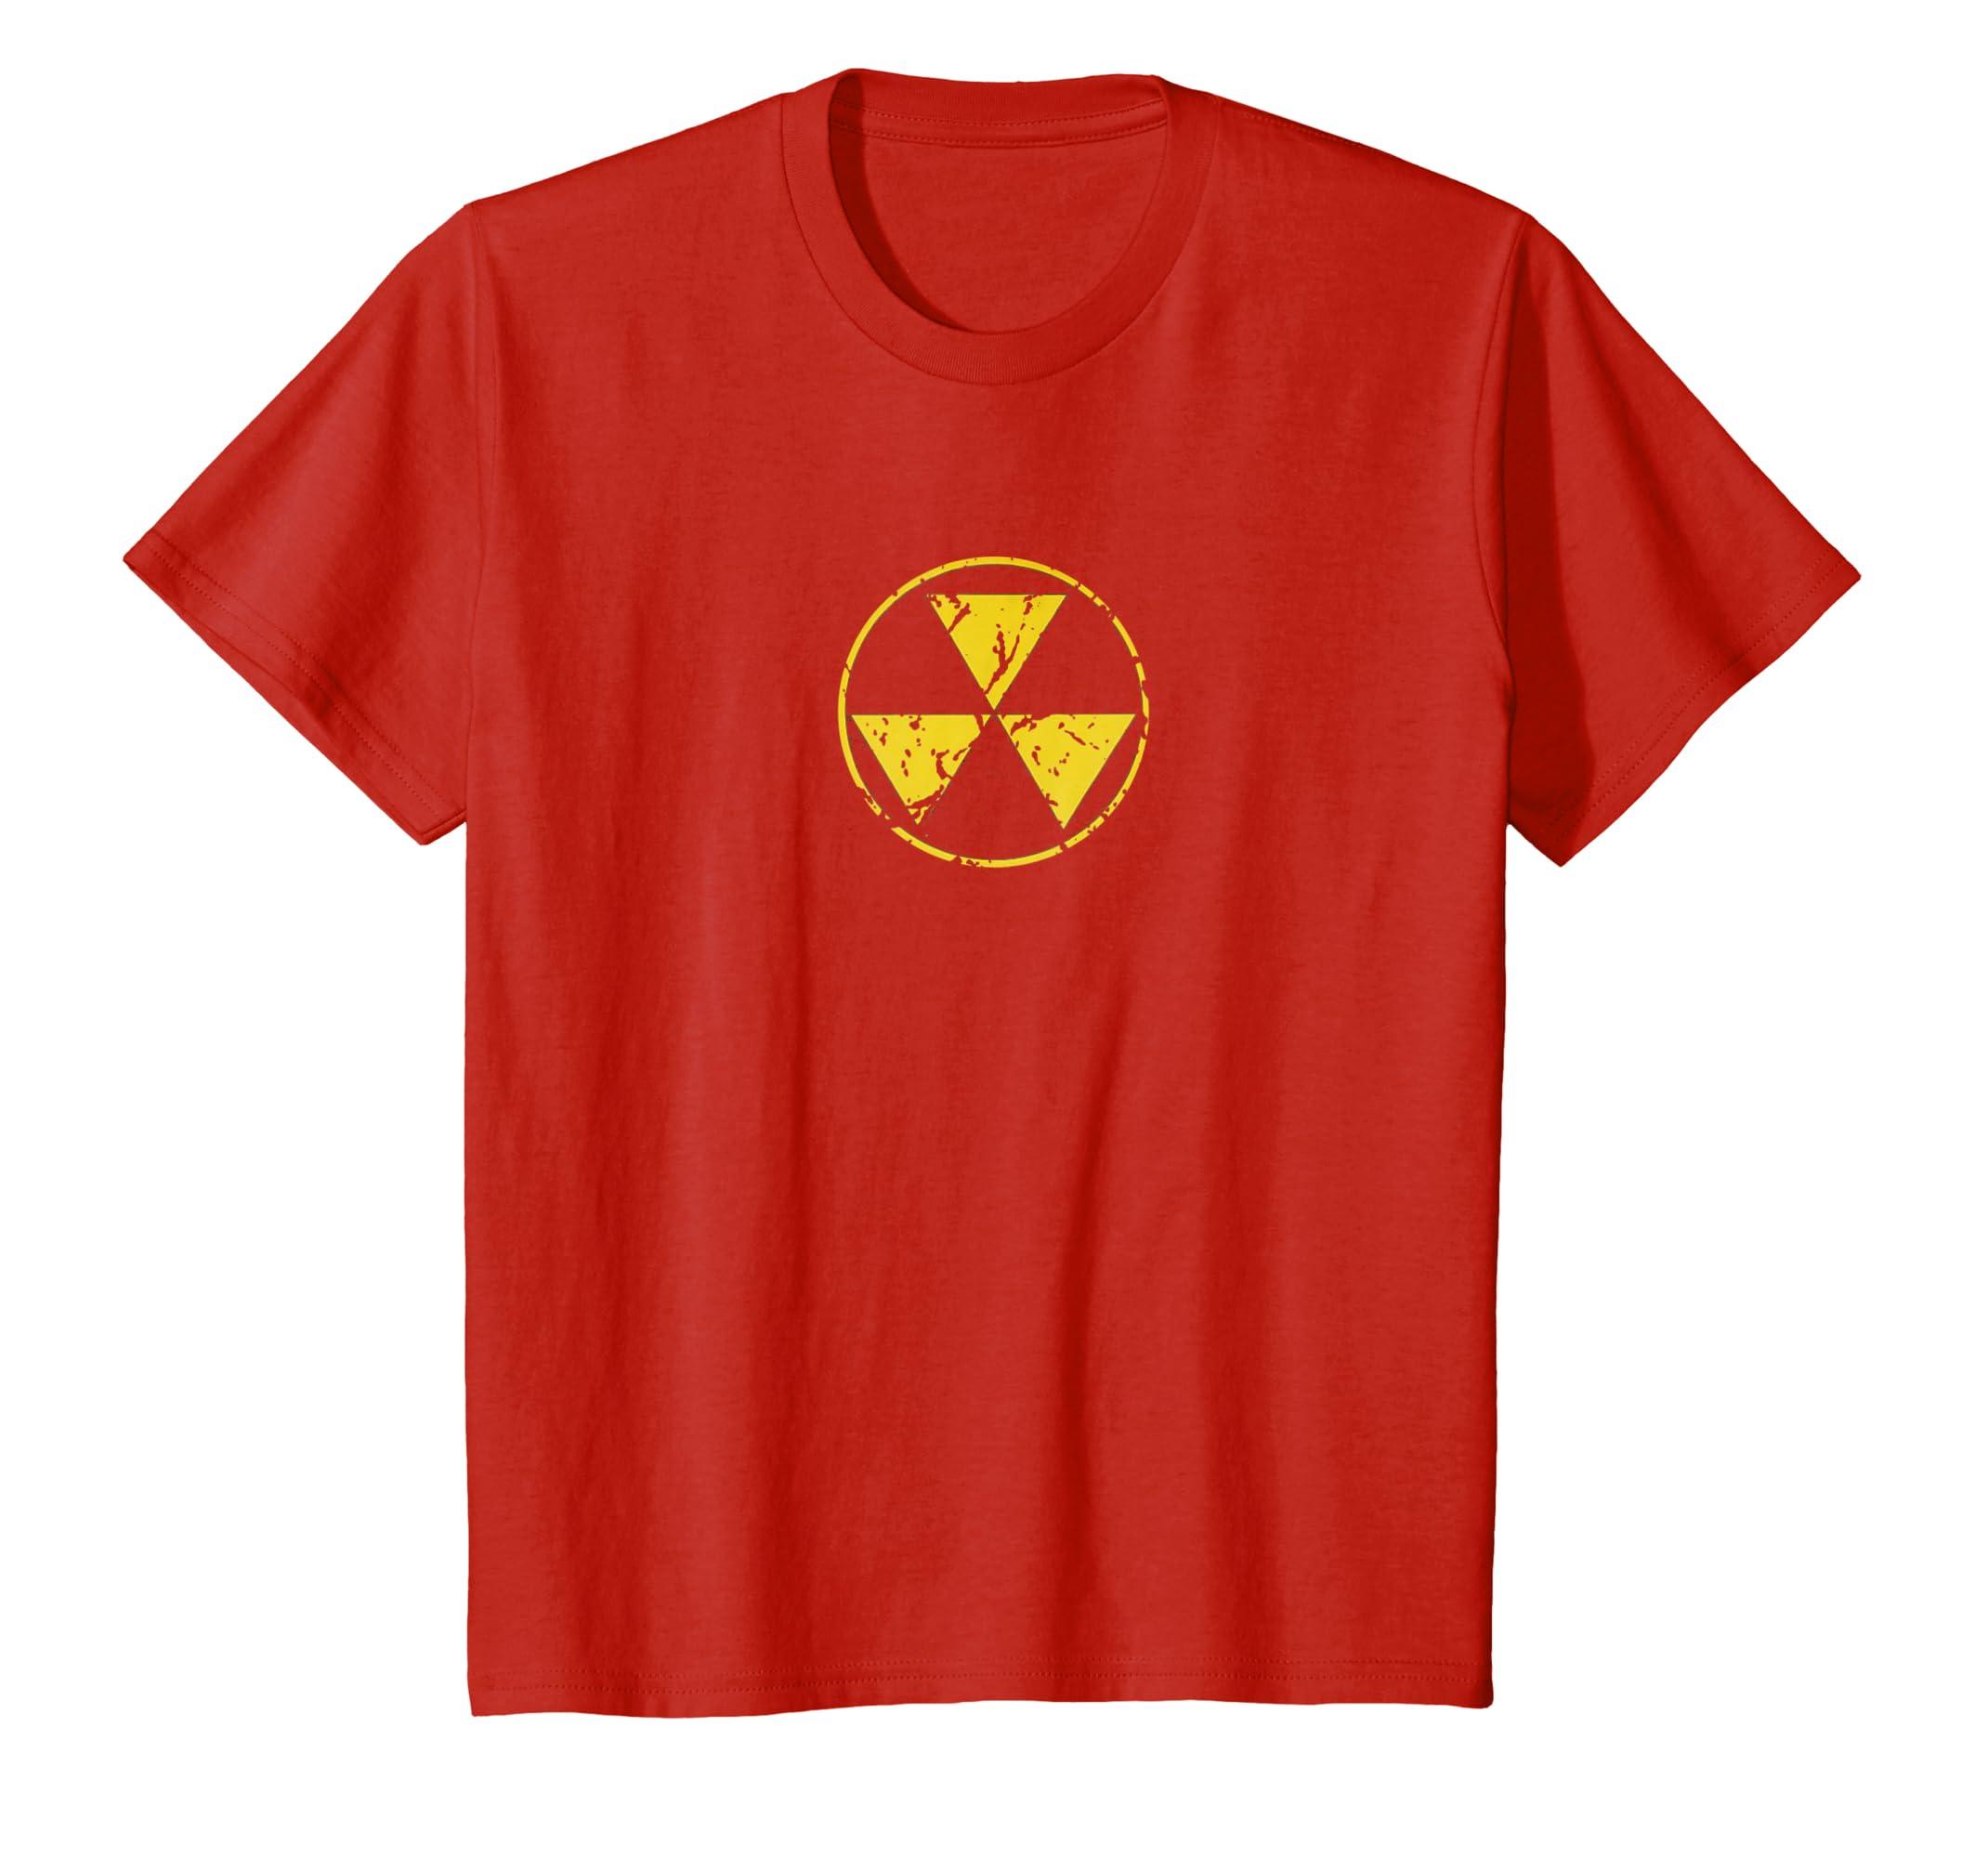 Fallout Shelter Nostalgia >> Amazon Com Fallout Shelter Nuclear War Radiation Nostalgia T Shirt